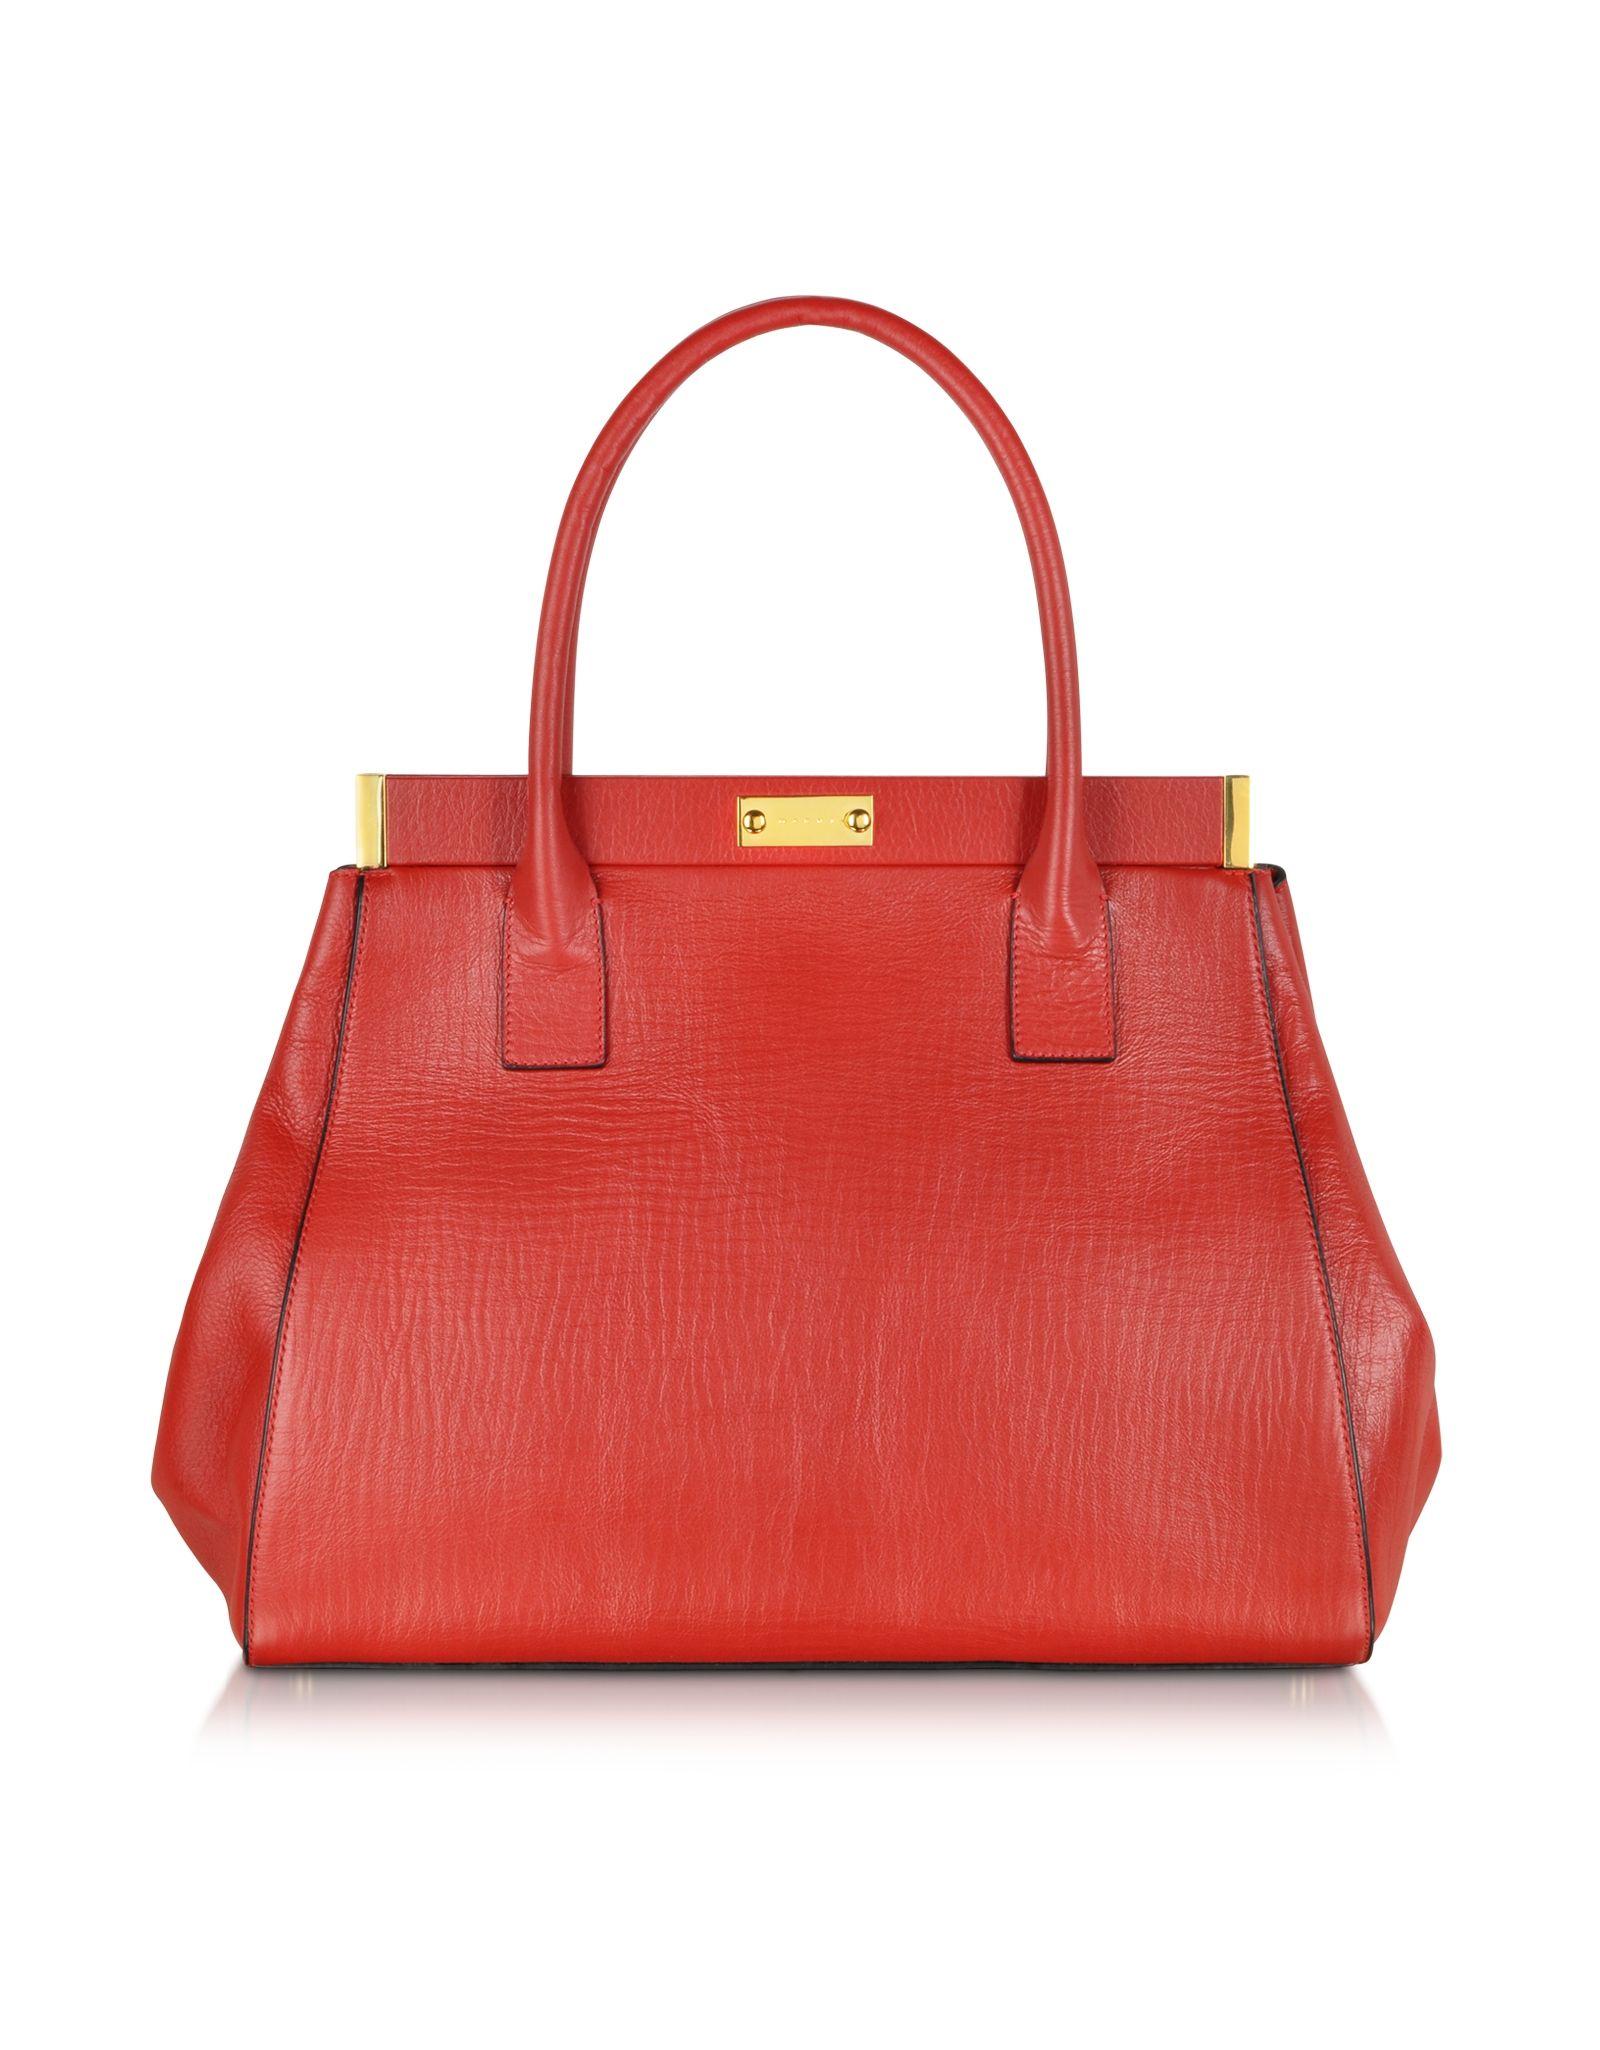 Marni Deep Red Leather Handbag at FORZIERI e1f8fe84c0320